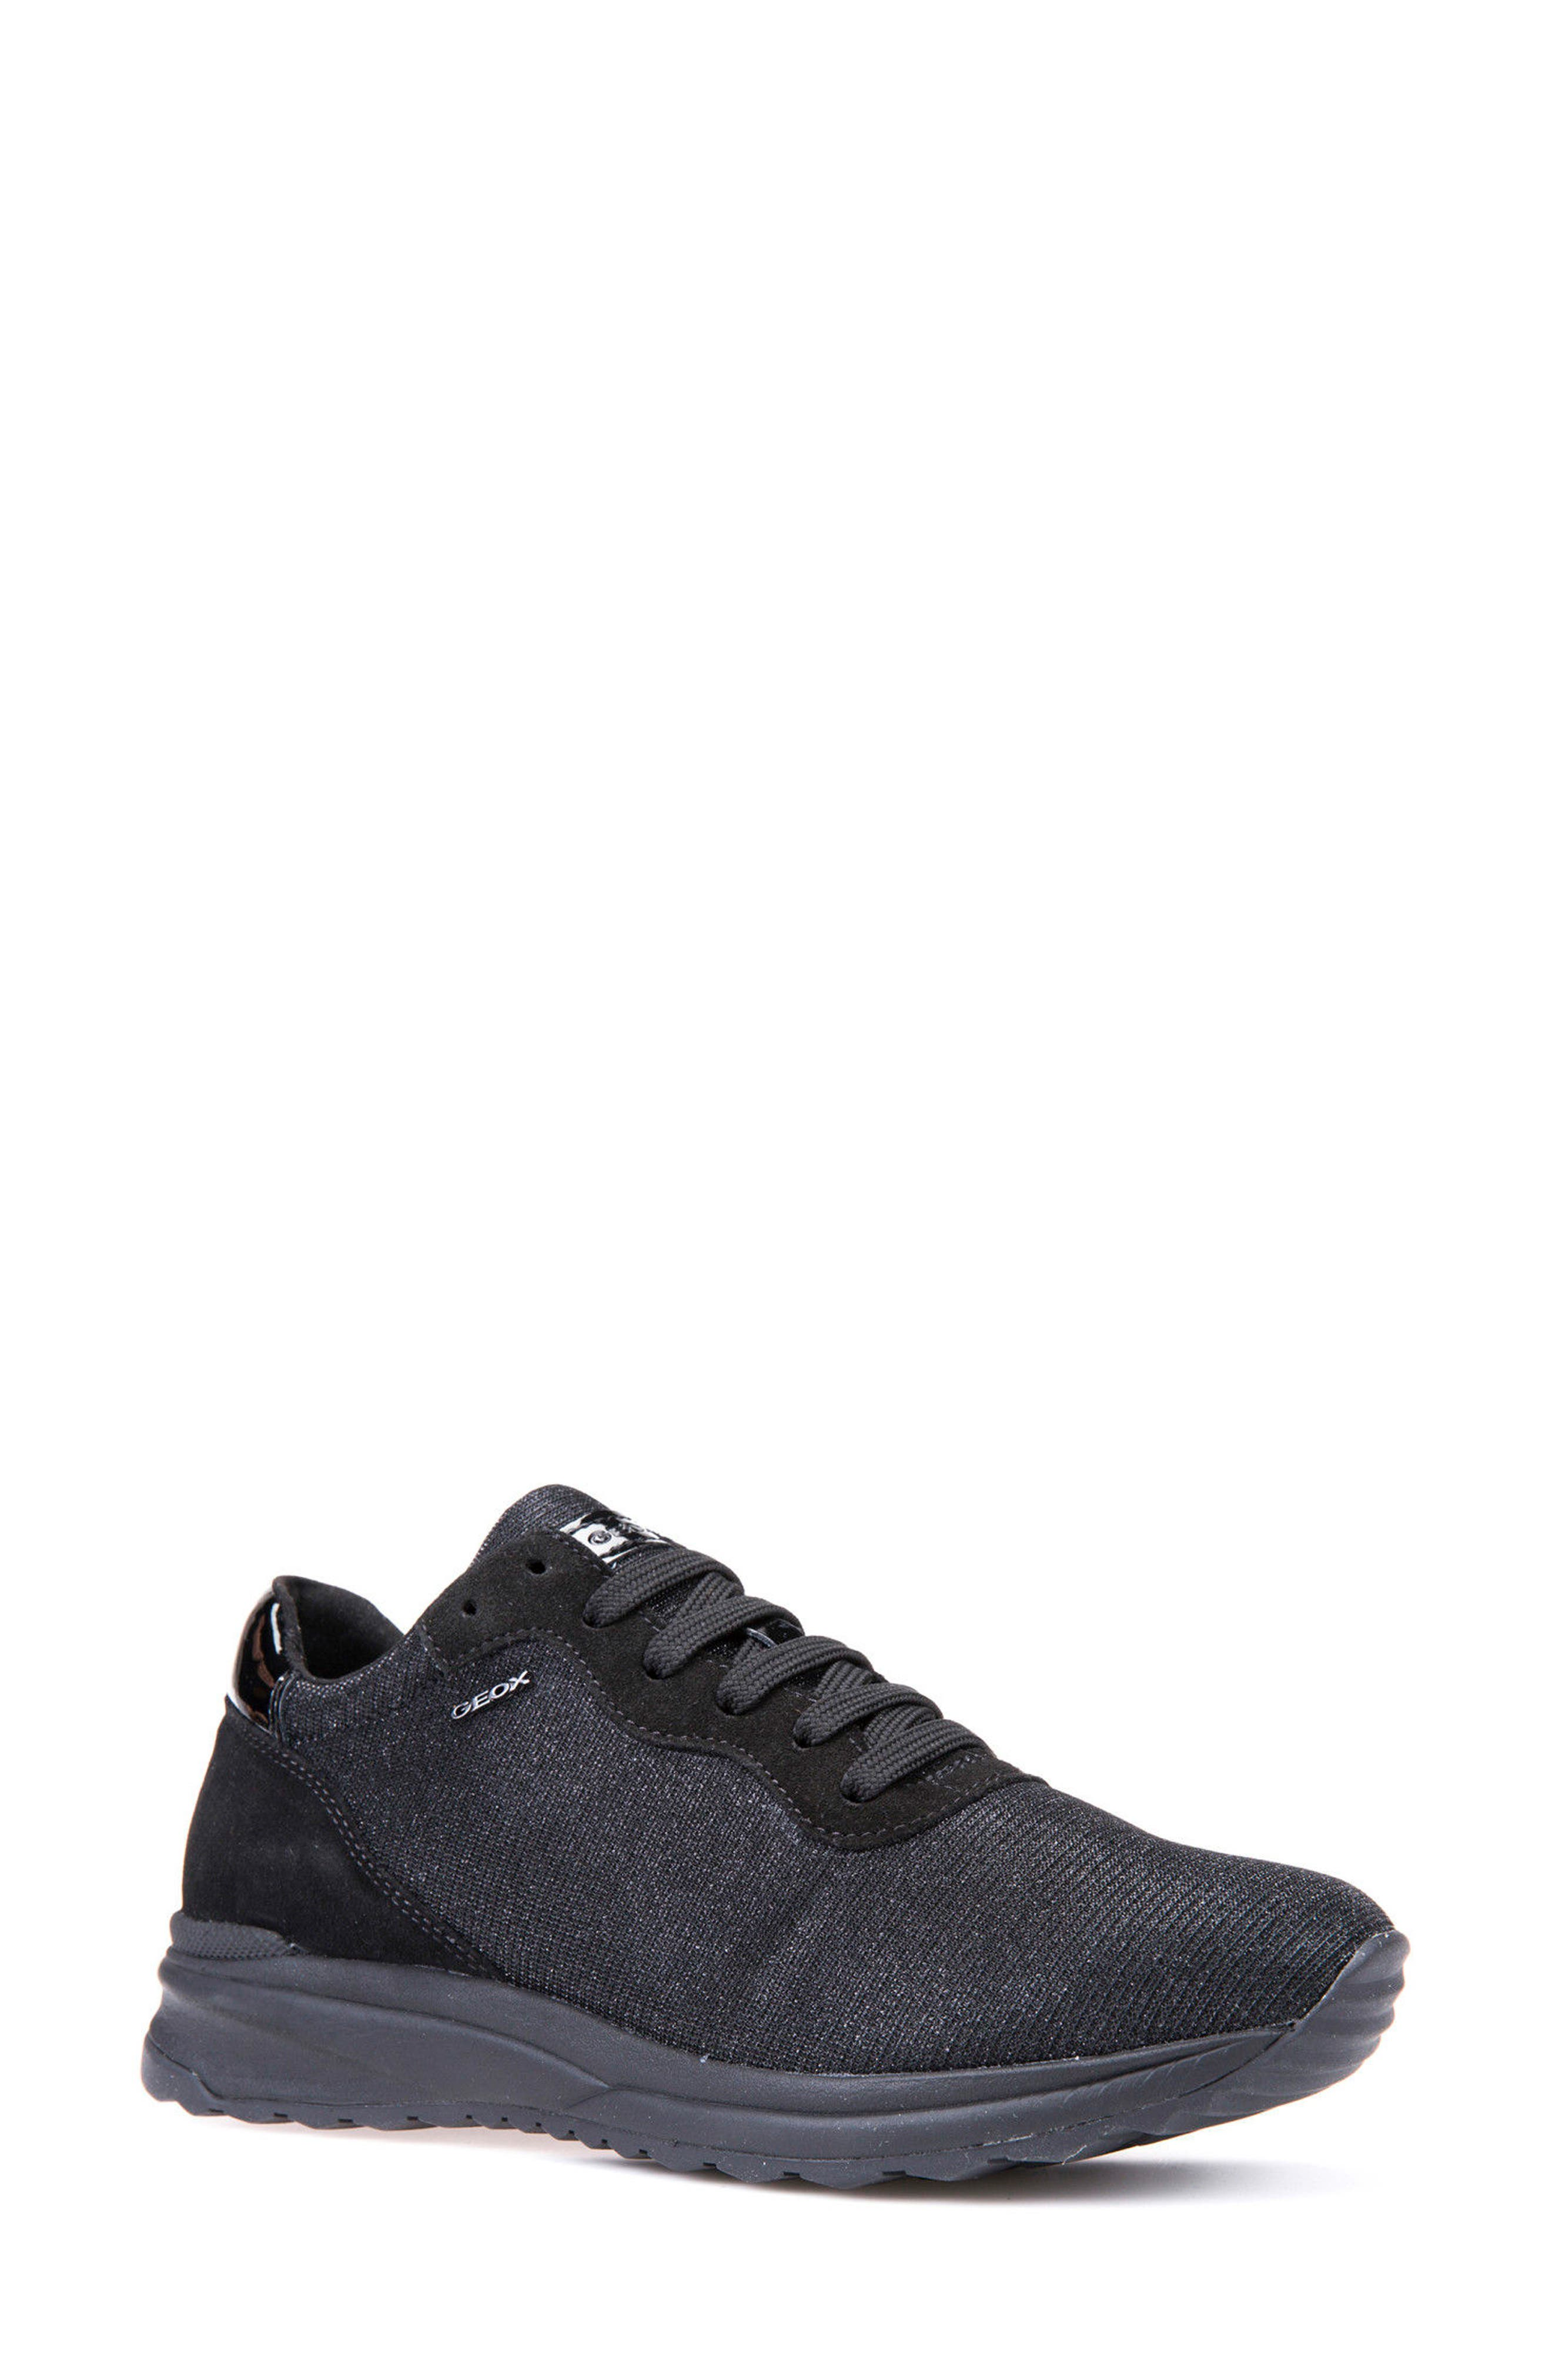 Airell Sneaker,                             Main thumbnail 1, color,                             001